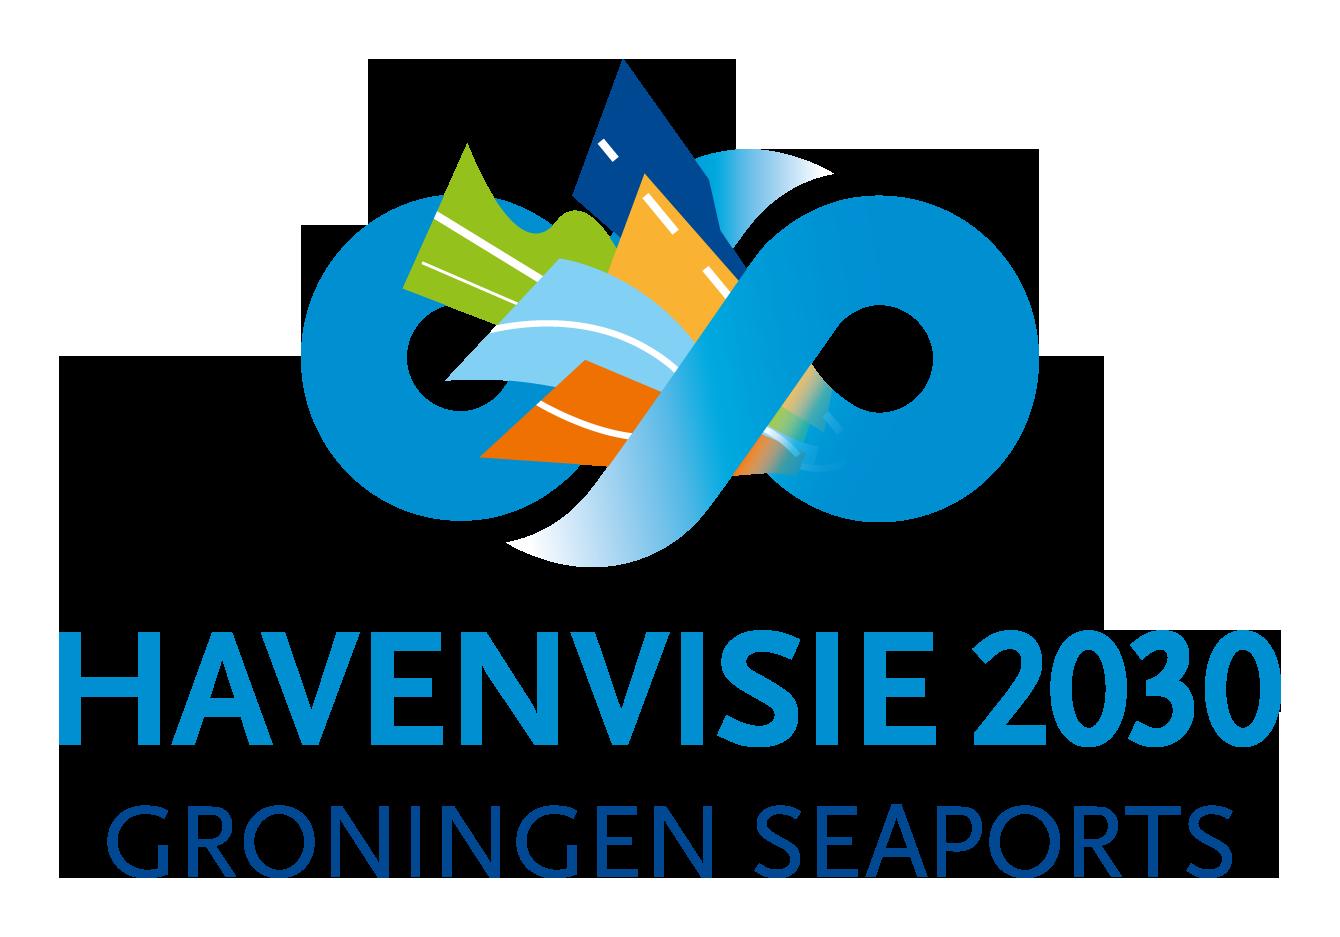 logo_havenvisie2030